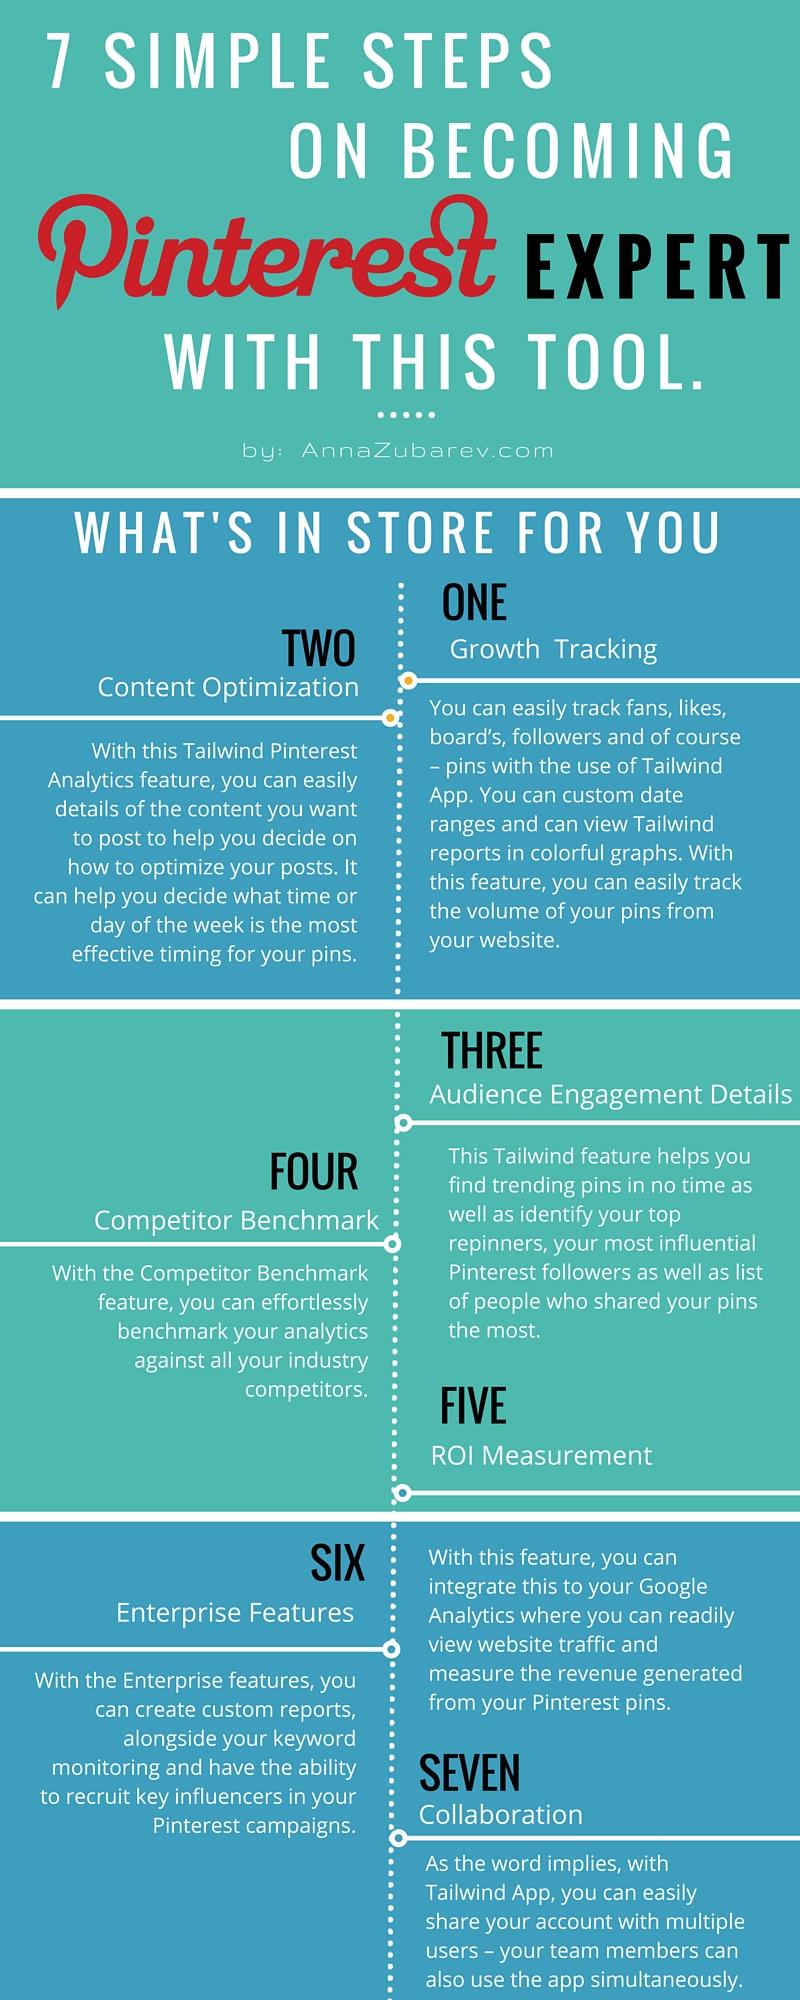 7 Simple Steps on Becoming A Pinterest Expert. via @annazubarev #Infographic.